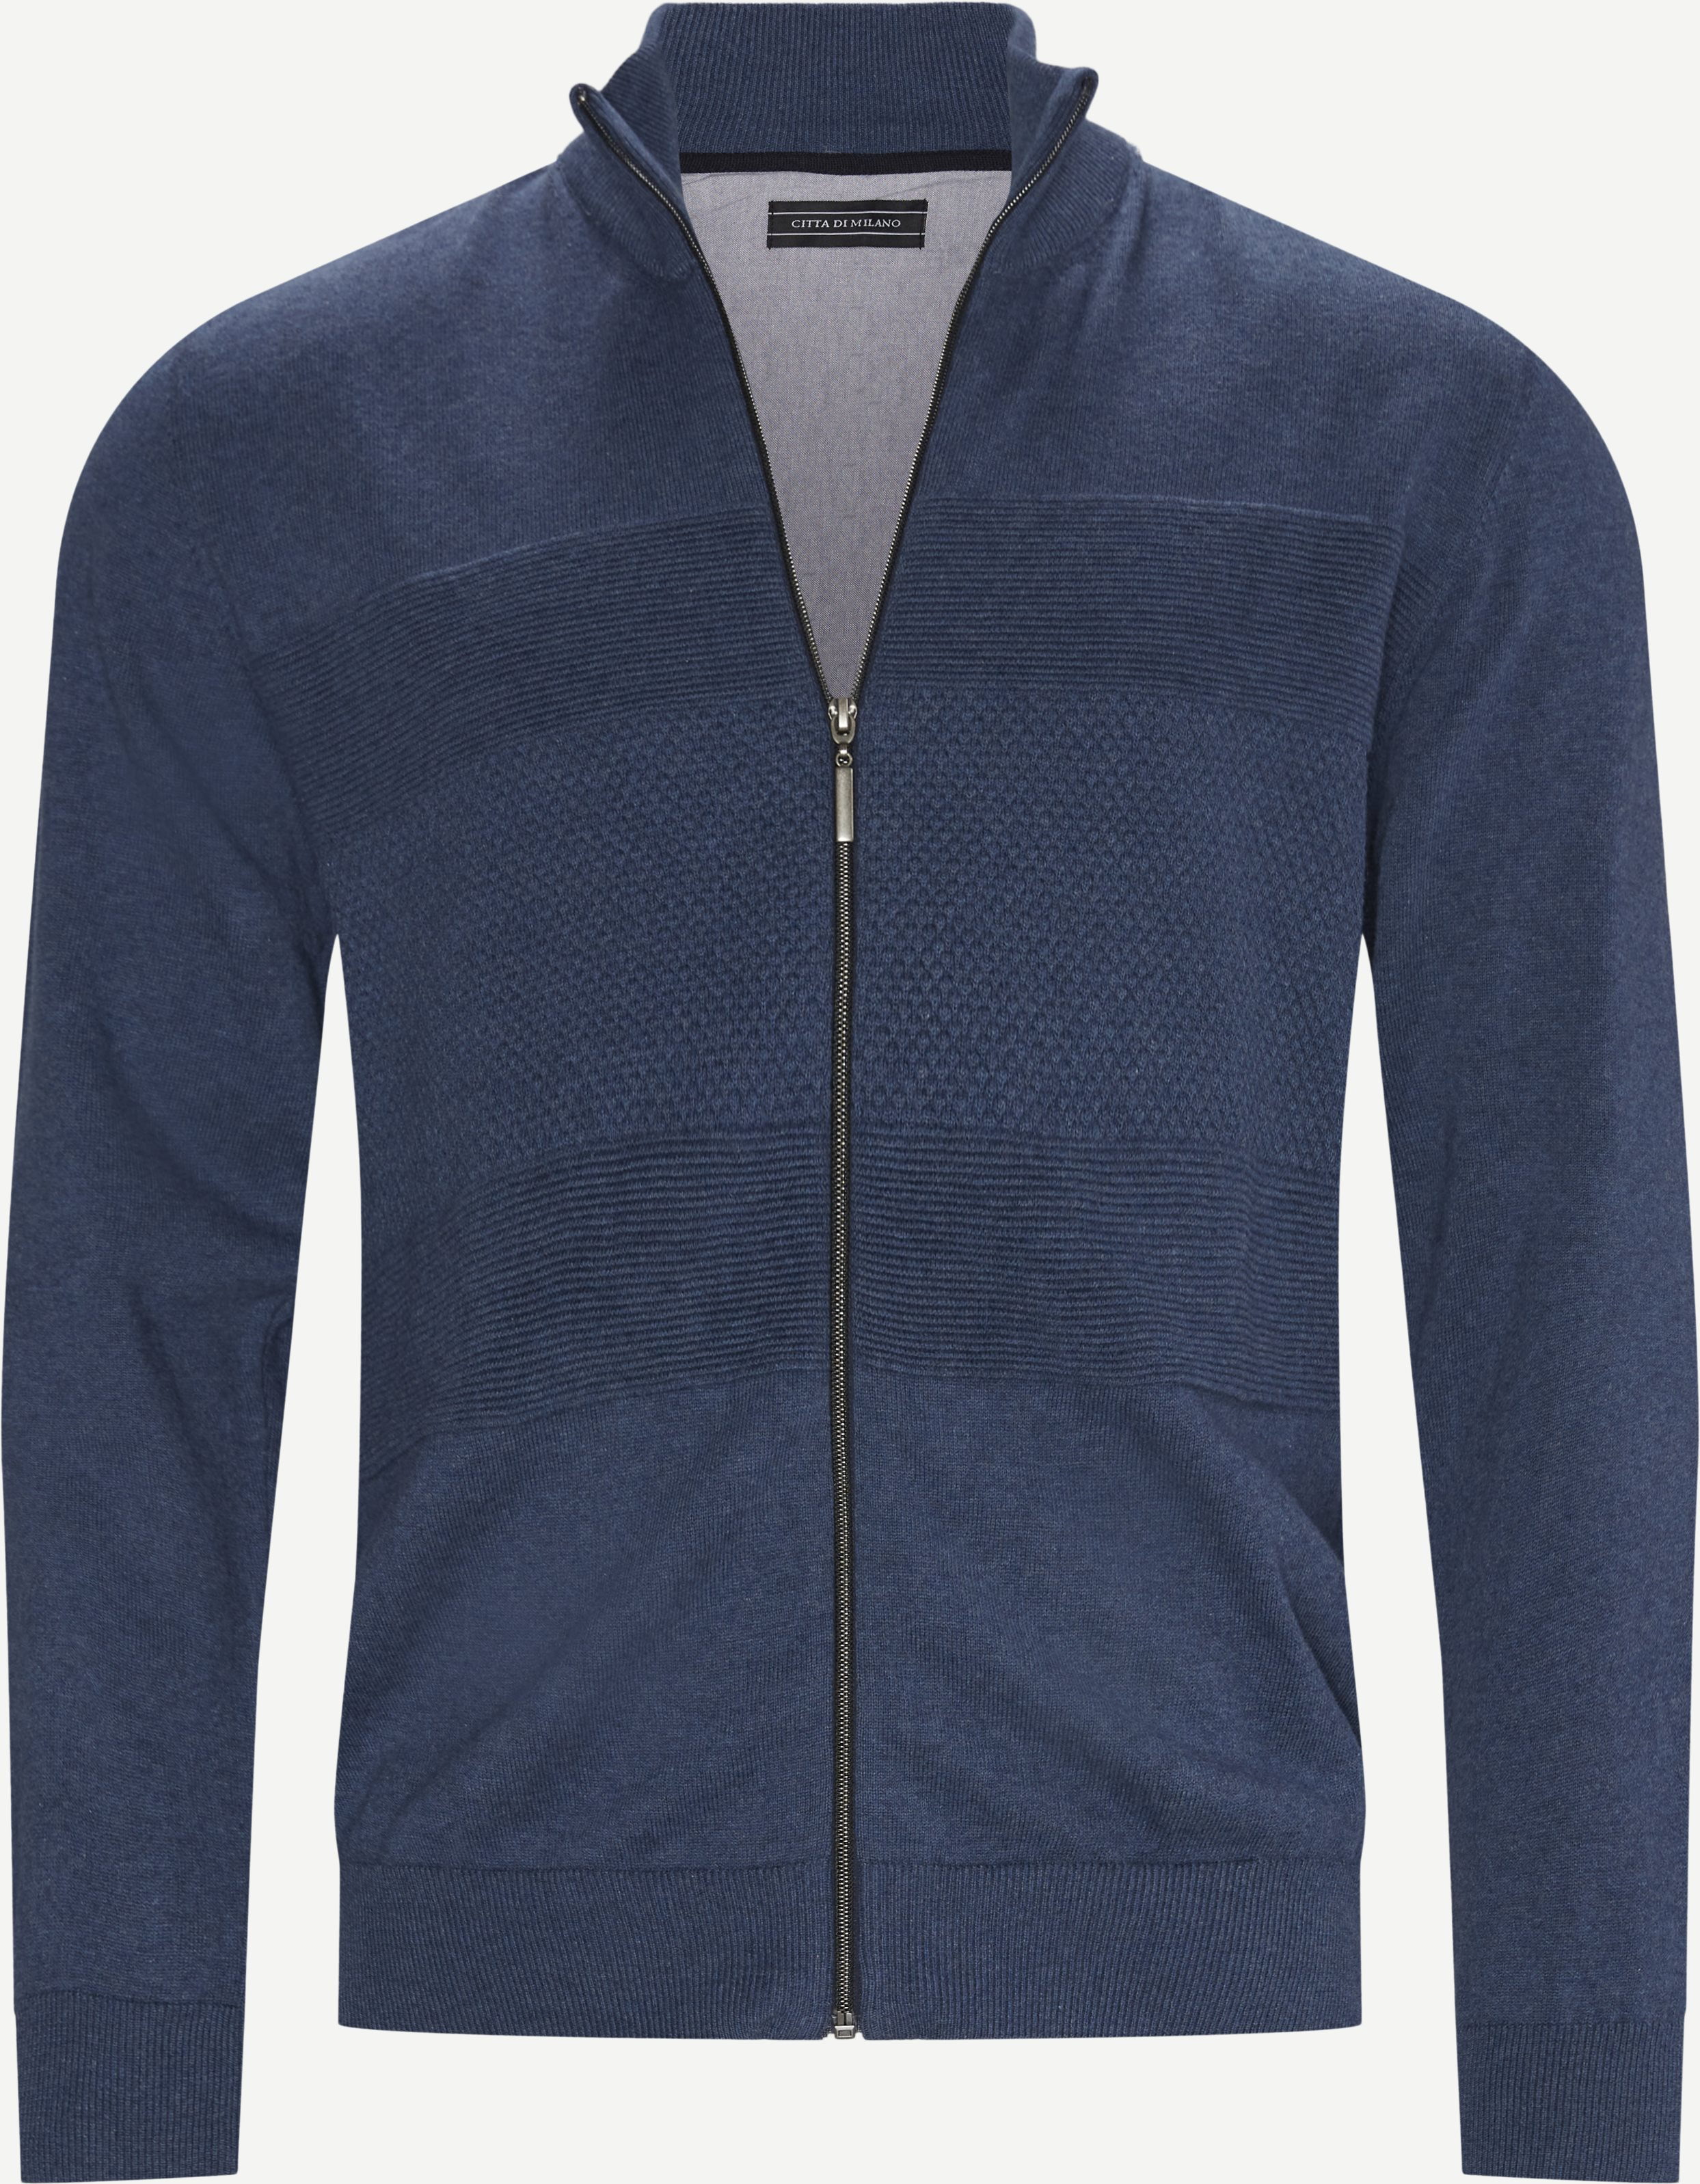 Strickwaren - Regular - Jeans-Blau